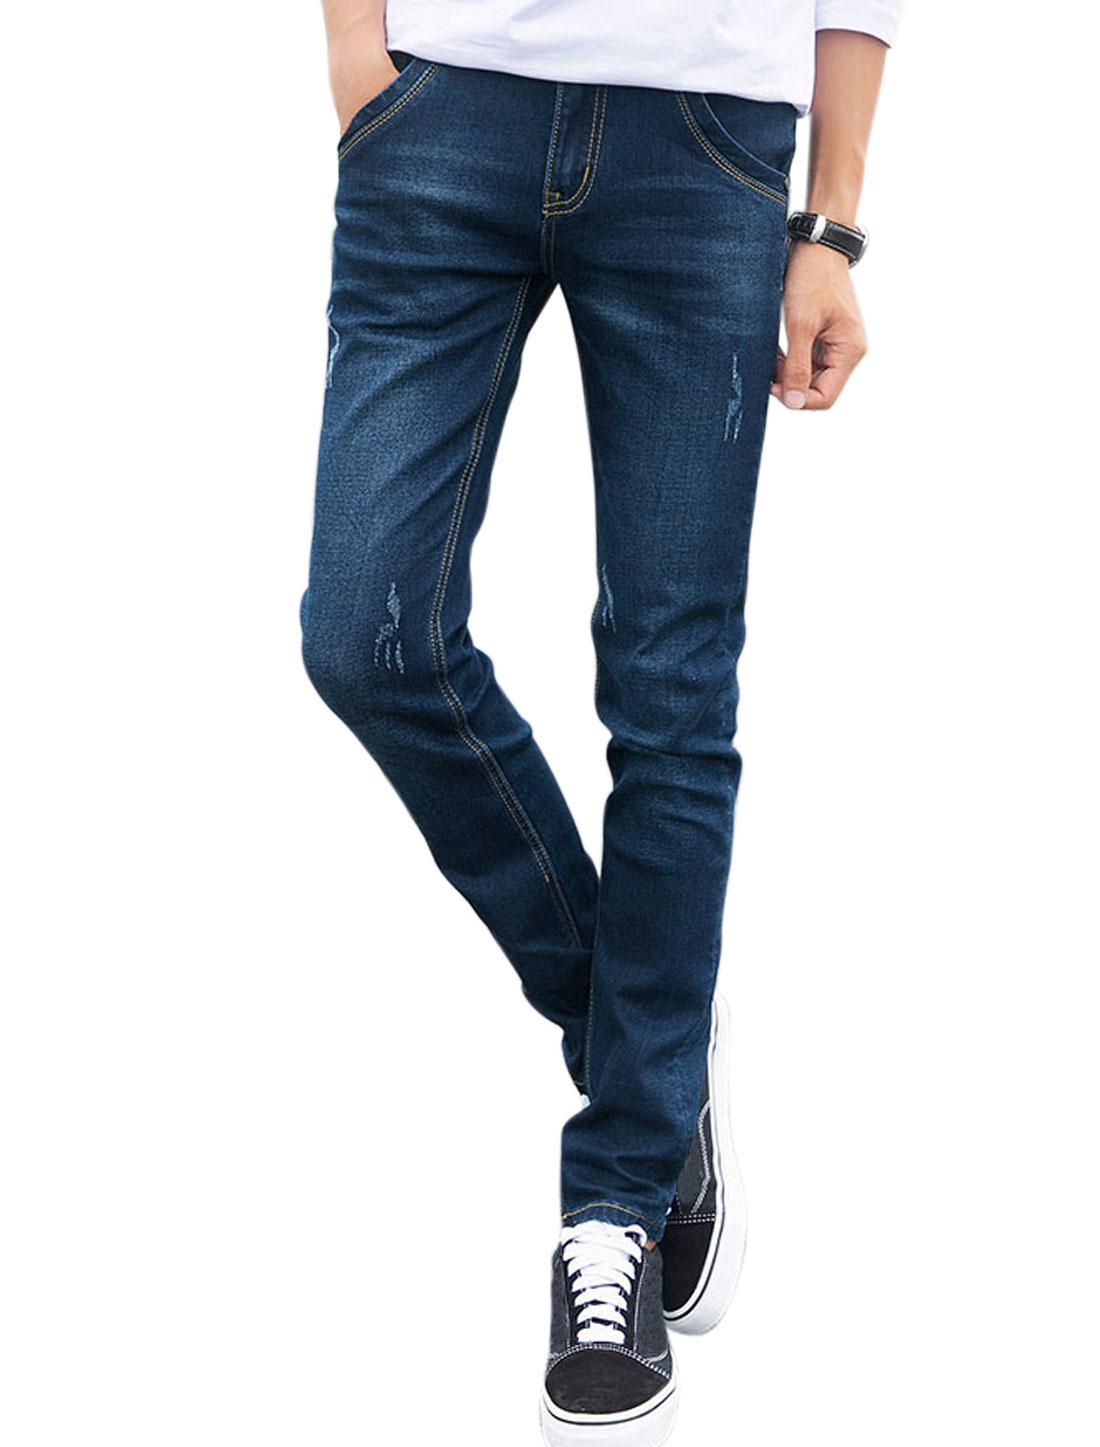 Men Slant Pockets Disressed Straight Leg Denim Pants Blue W32